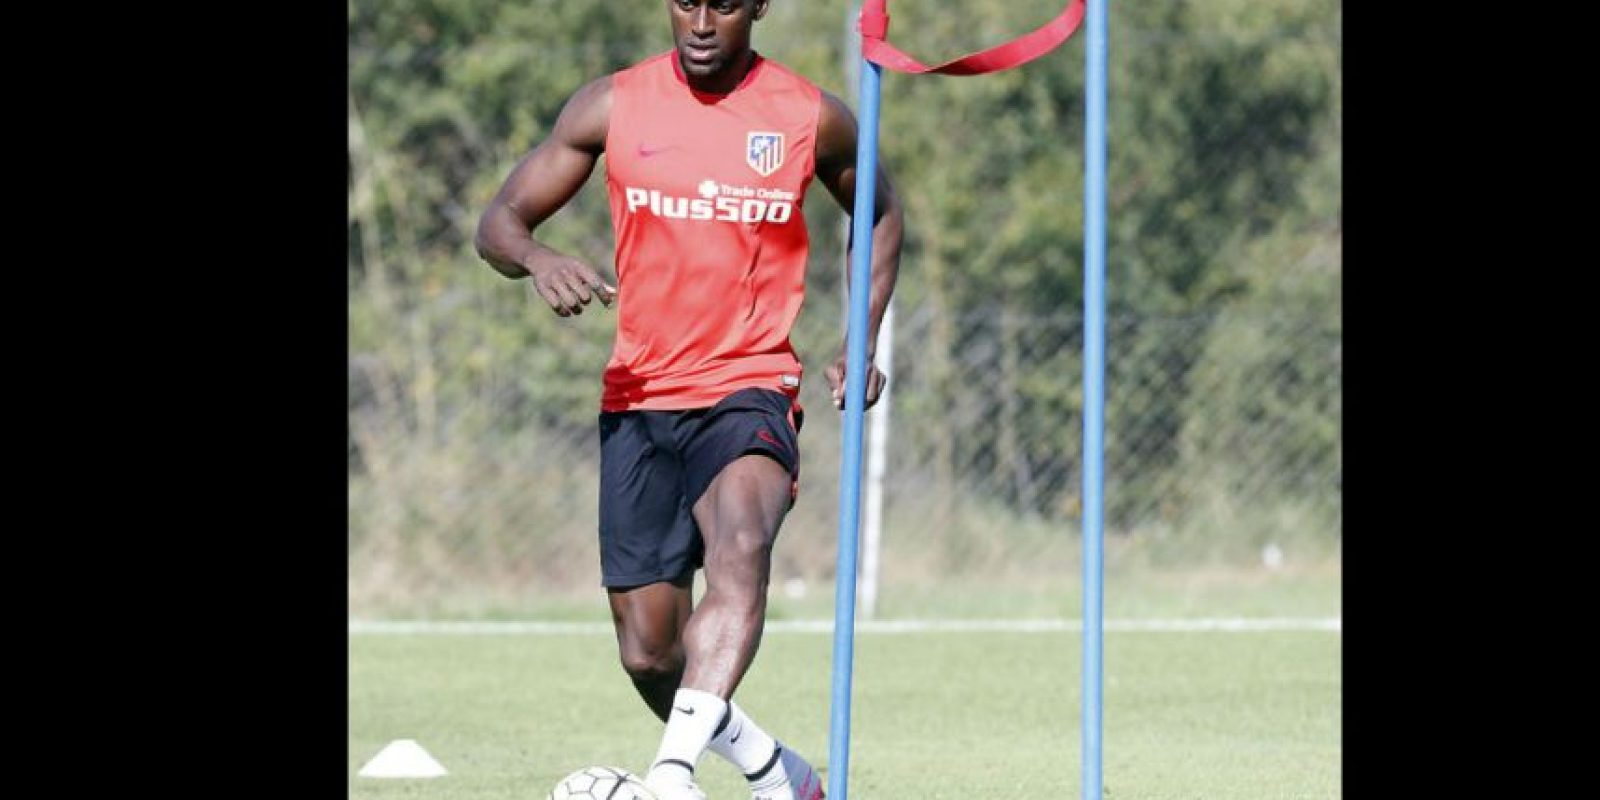 Jackson llegó al Atlético de Madrid por 35 millones de euros. Foto:Vía twitter.com/Atleti